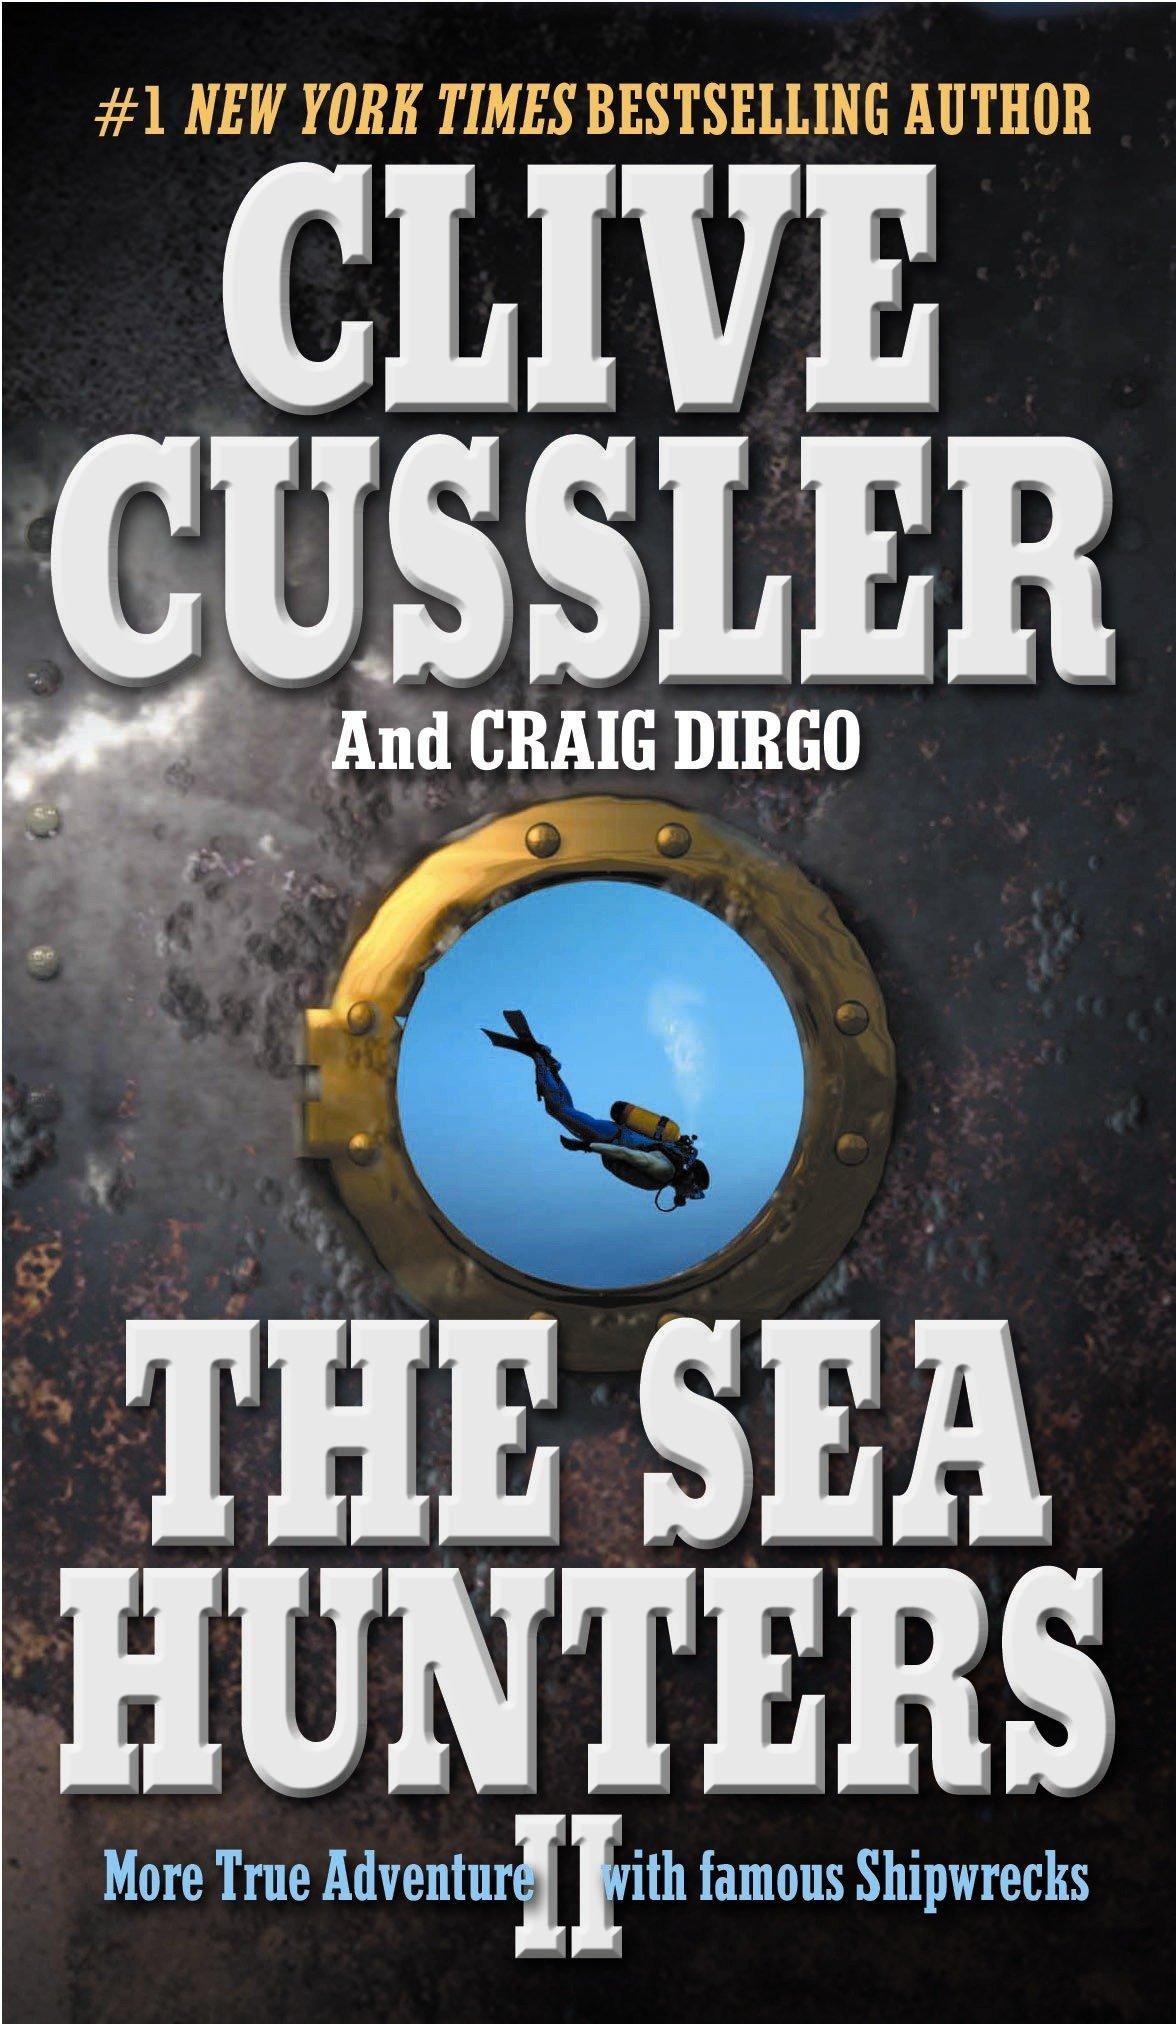 Clive Cussler books 21